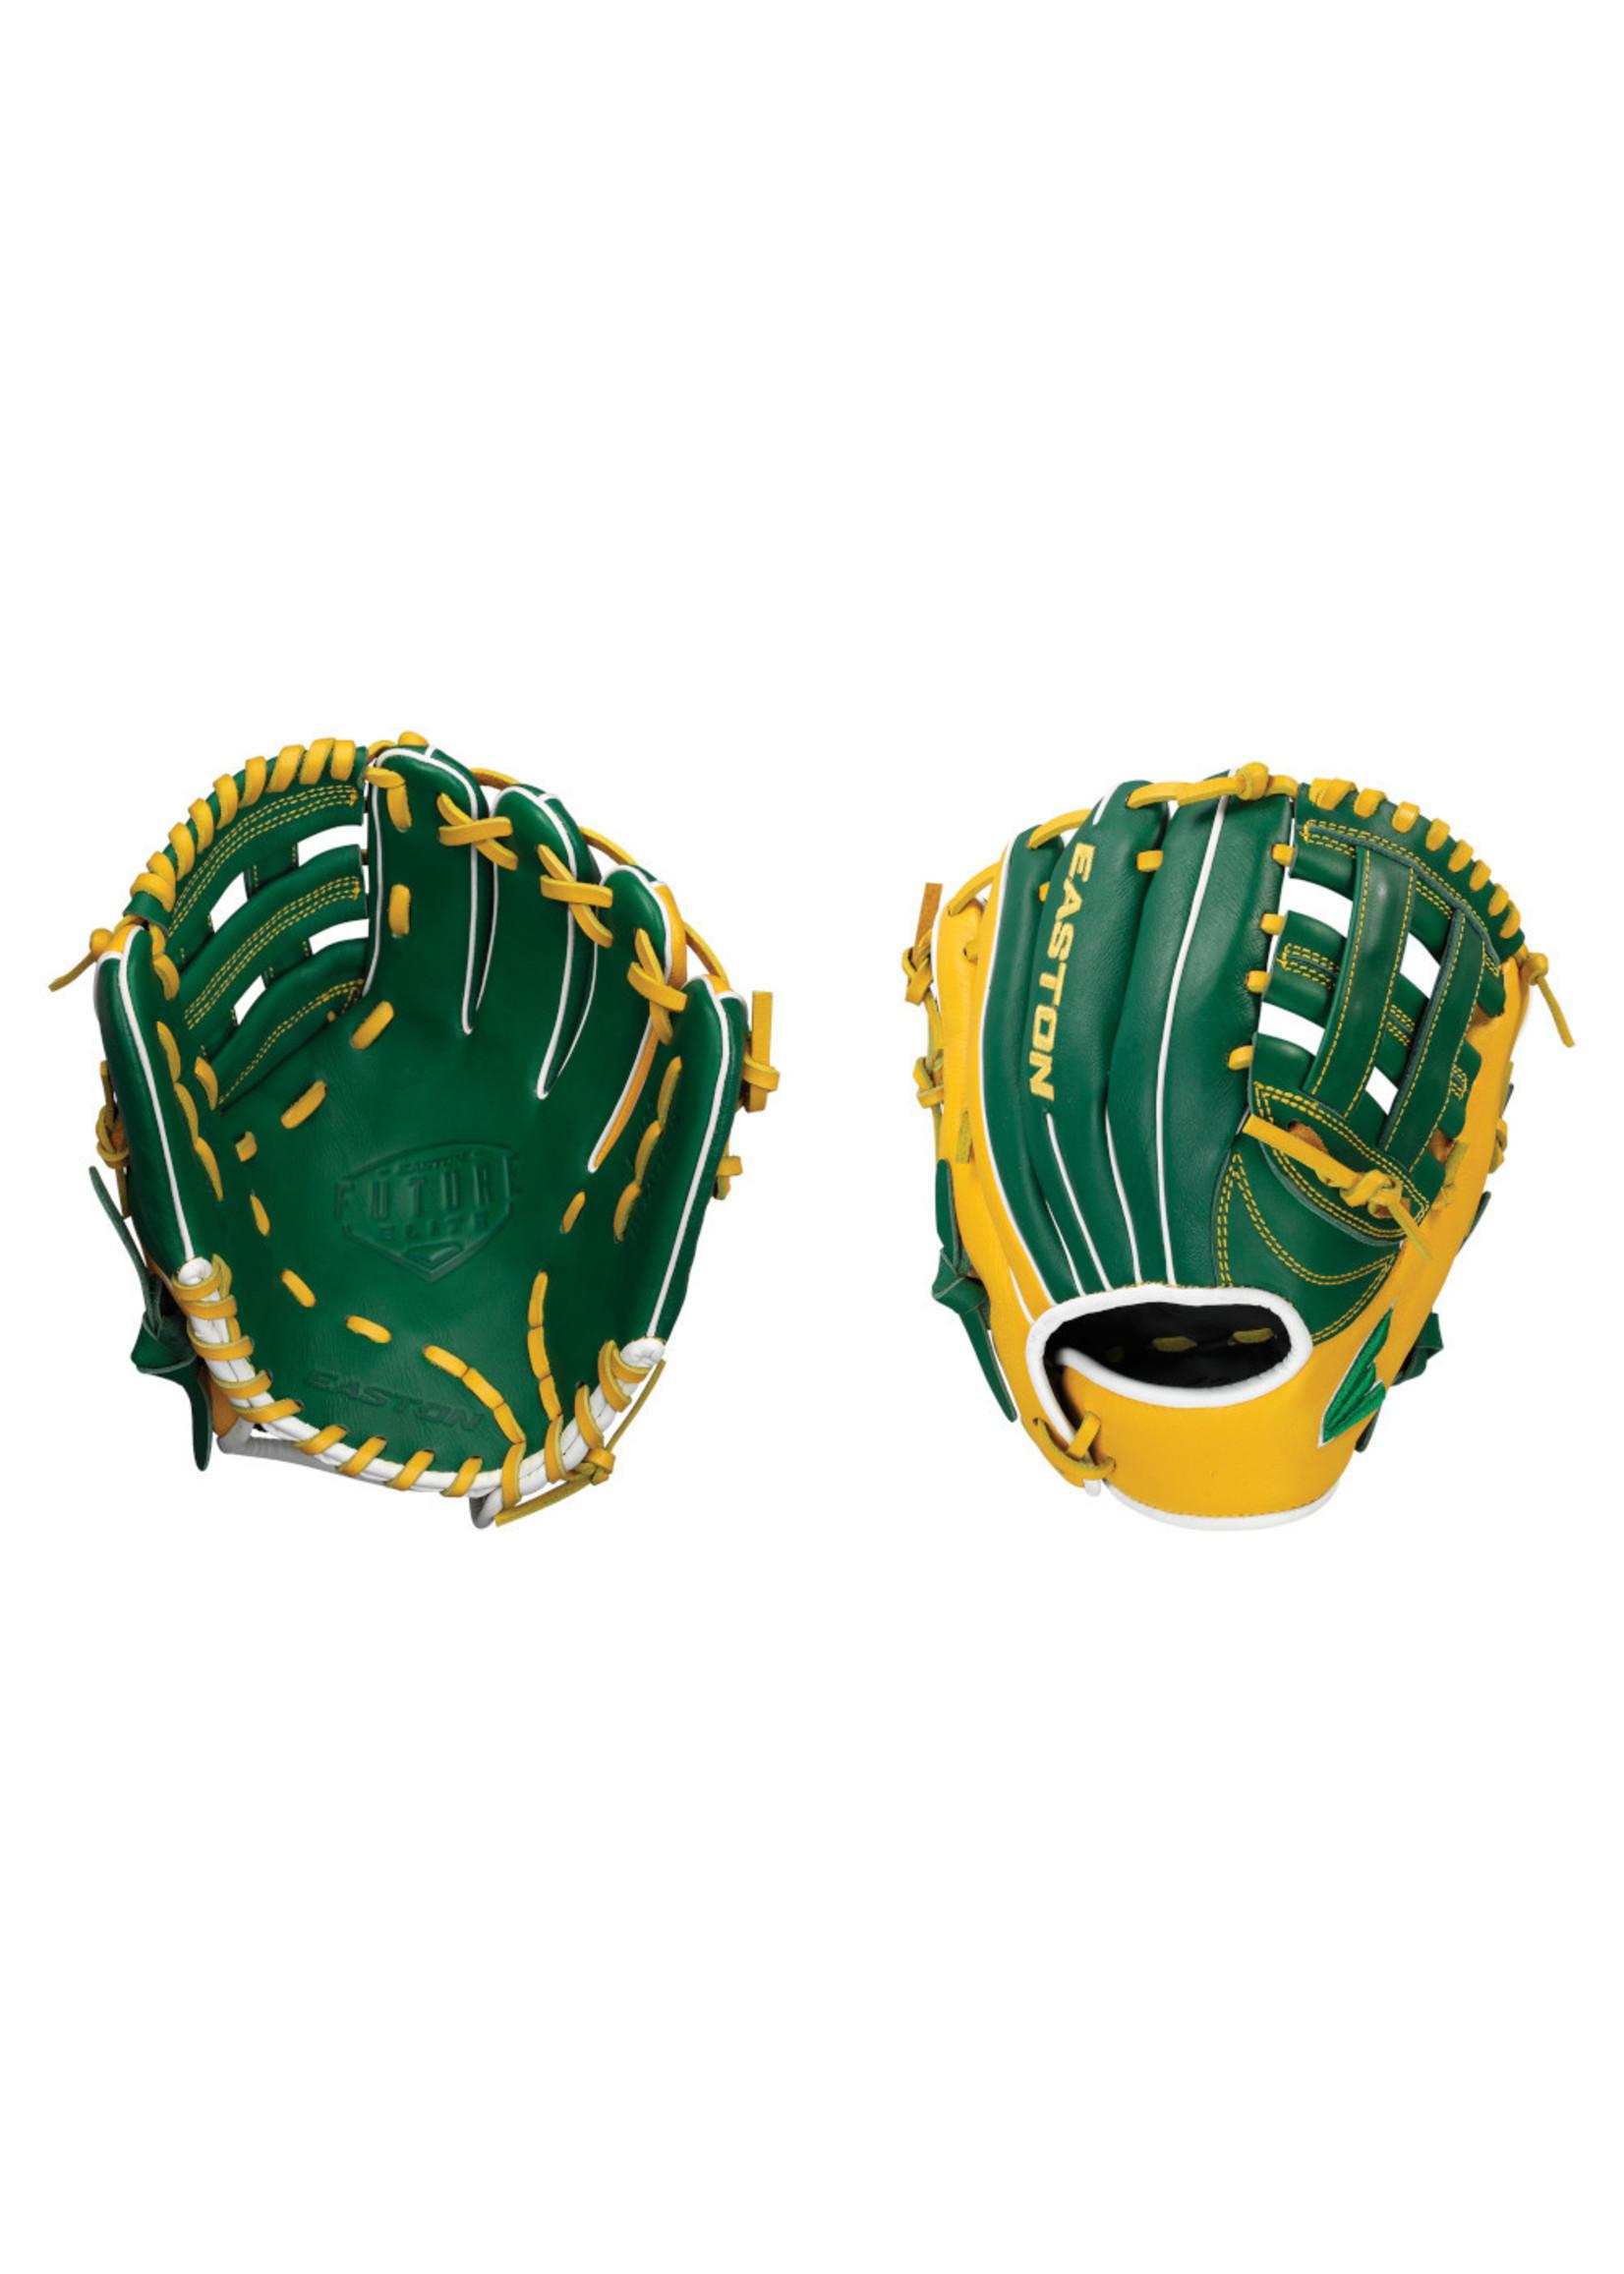 Easton Baseball (Canada) EASTON FUTURE ELITE 11'' GREEN/YELLOW YTH BASEBALL GLOVE